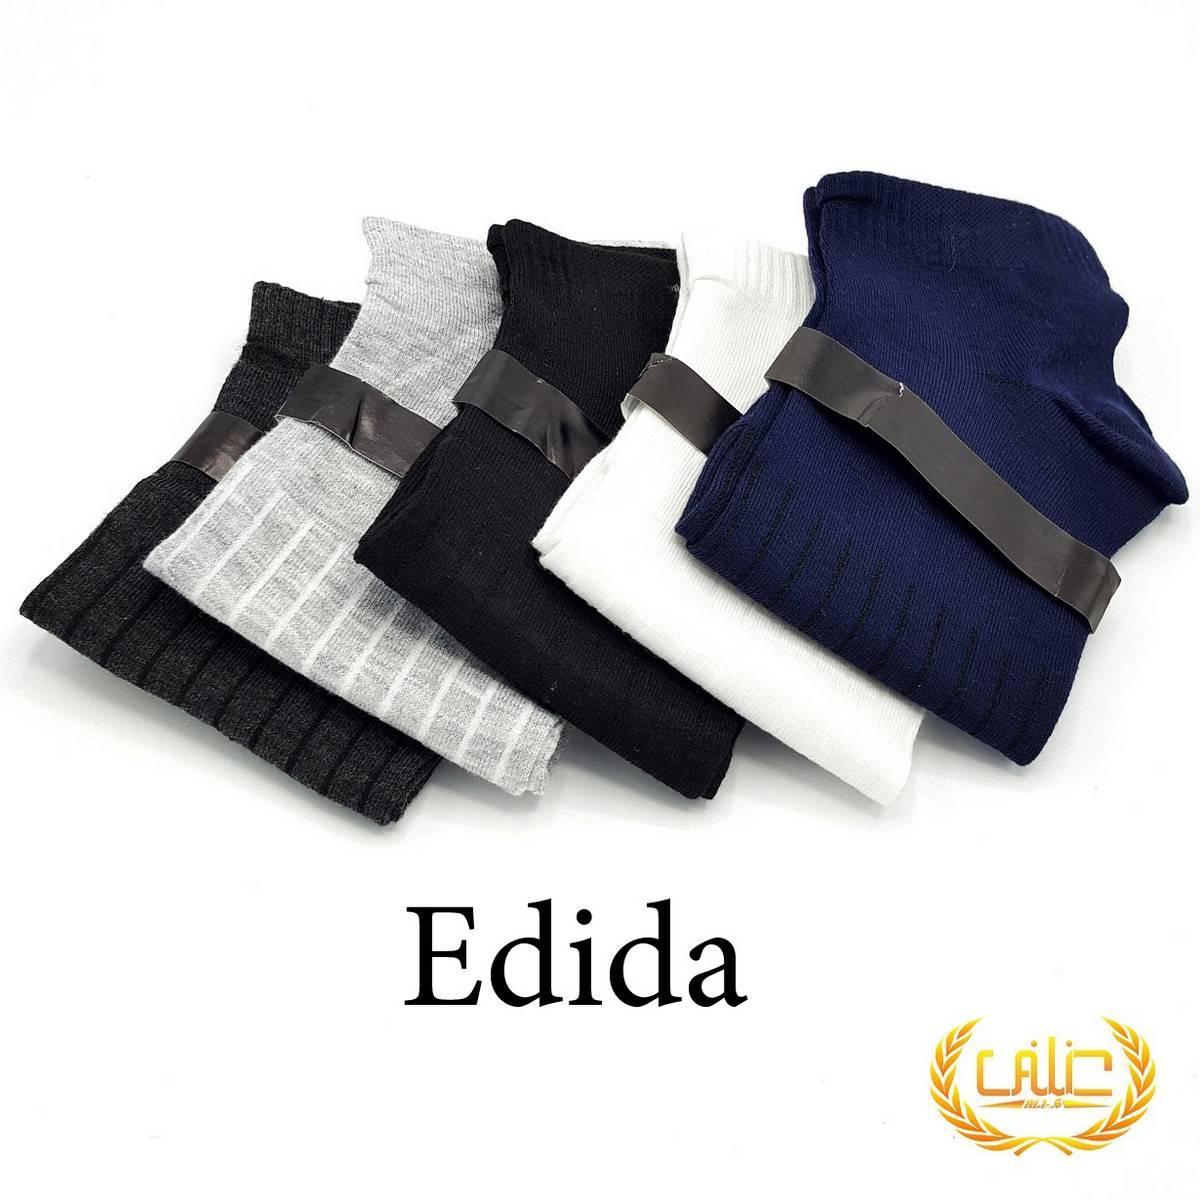 Pack of 5 High Quality Branded Men Socks Male Female Low Cut Ankle Solid Colour Men Short Dress Socks - AA487